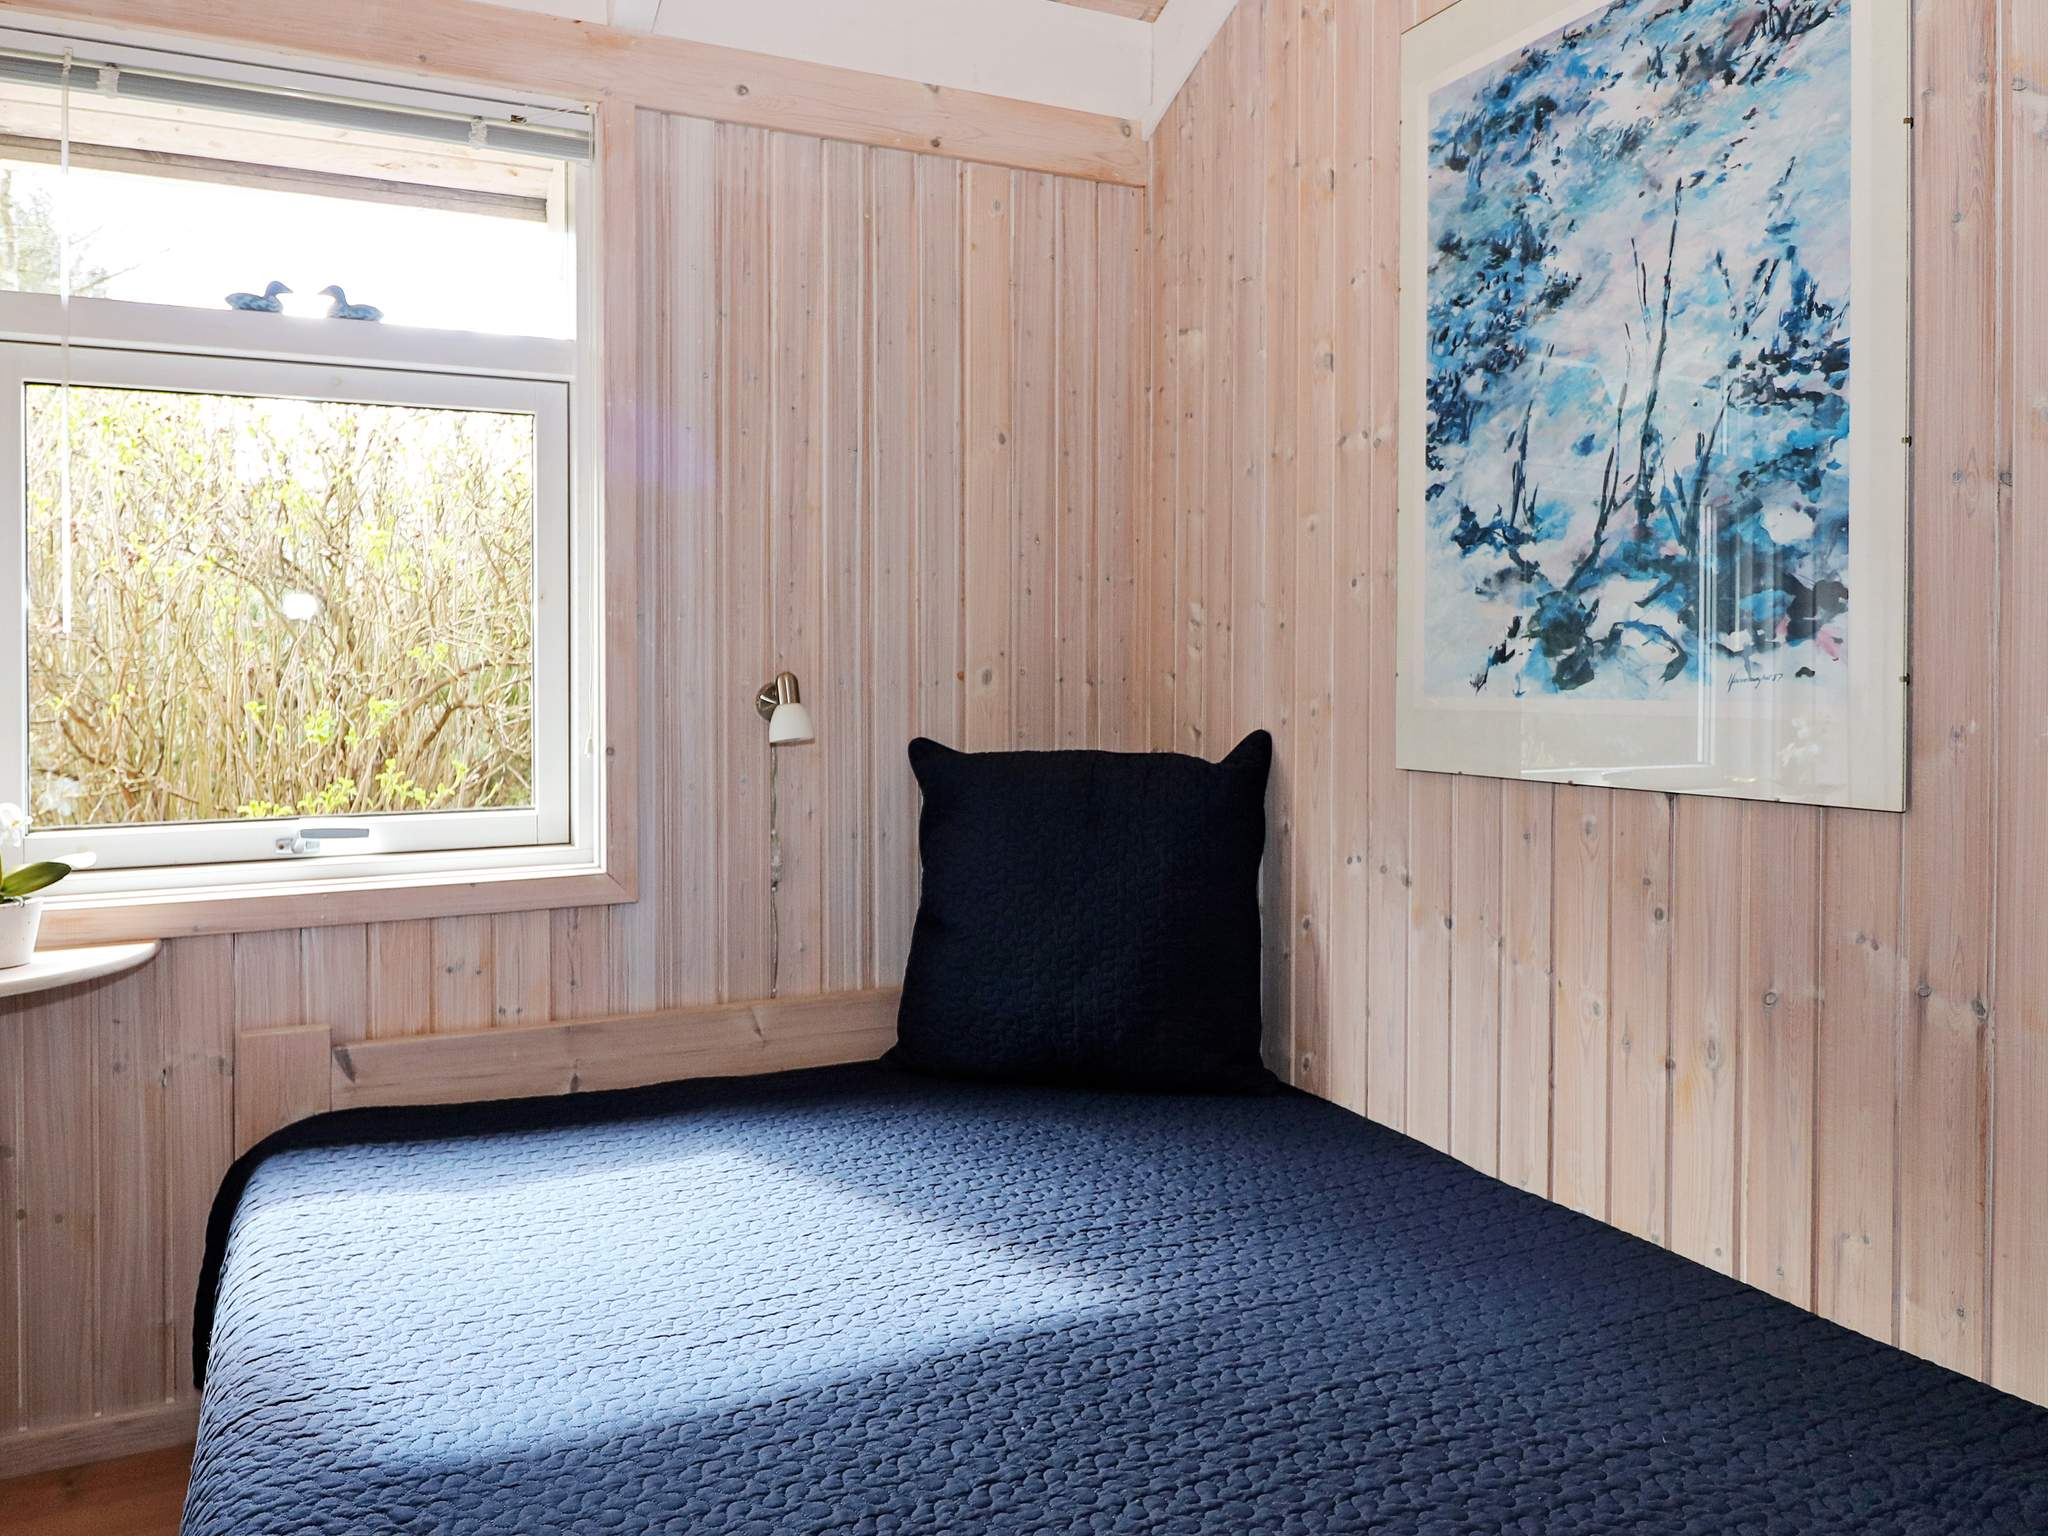 Ferienhaus Øster Hurup (83254), Øster Hurup, , Dänische Ostsee, Dänemark, Bild 8